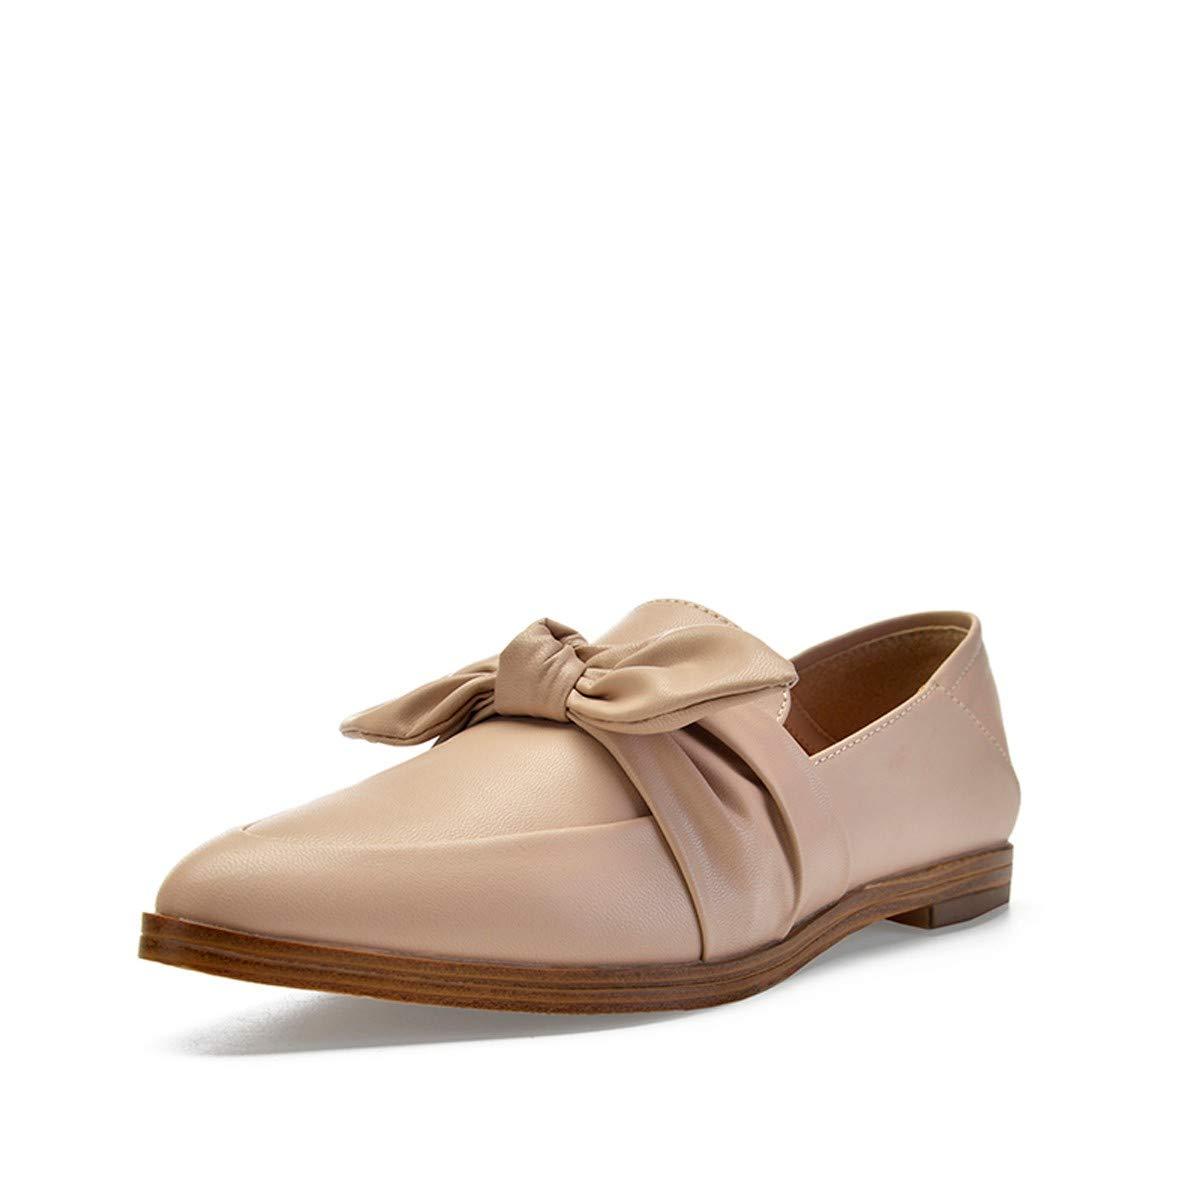 KPHY-Sommer Damenschuhe Weichen Boden Flachen Boden Wild Studenten Damen - Sandaleen